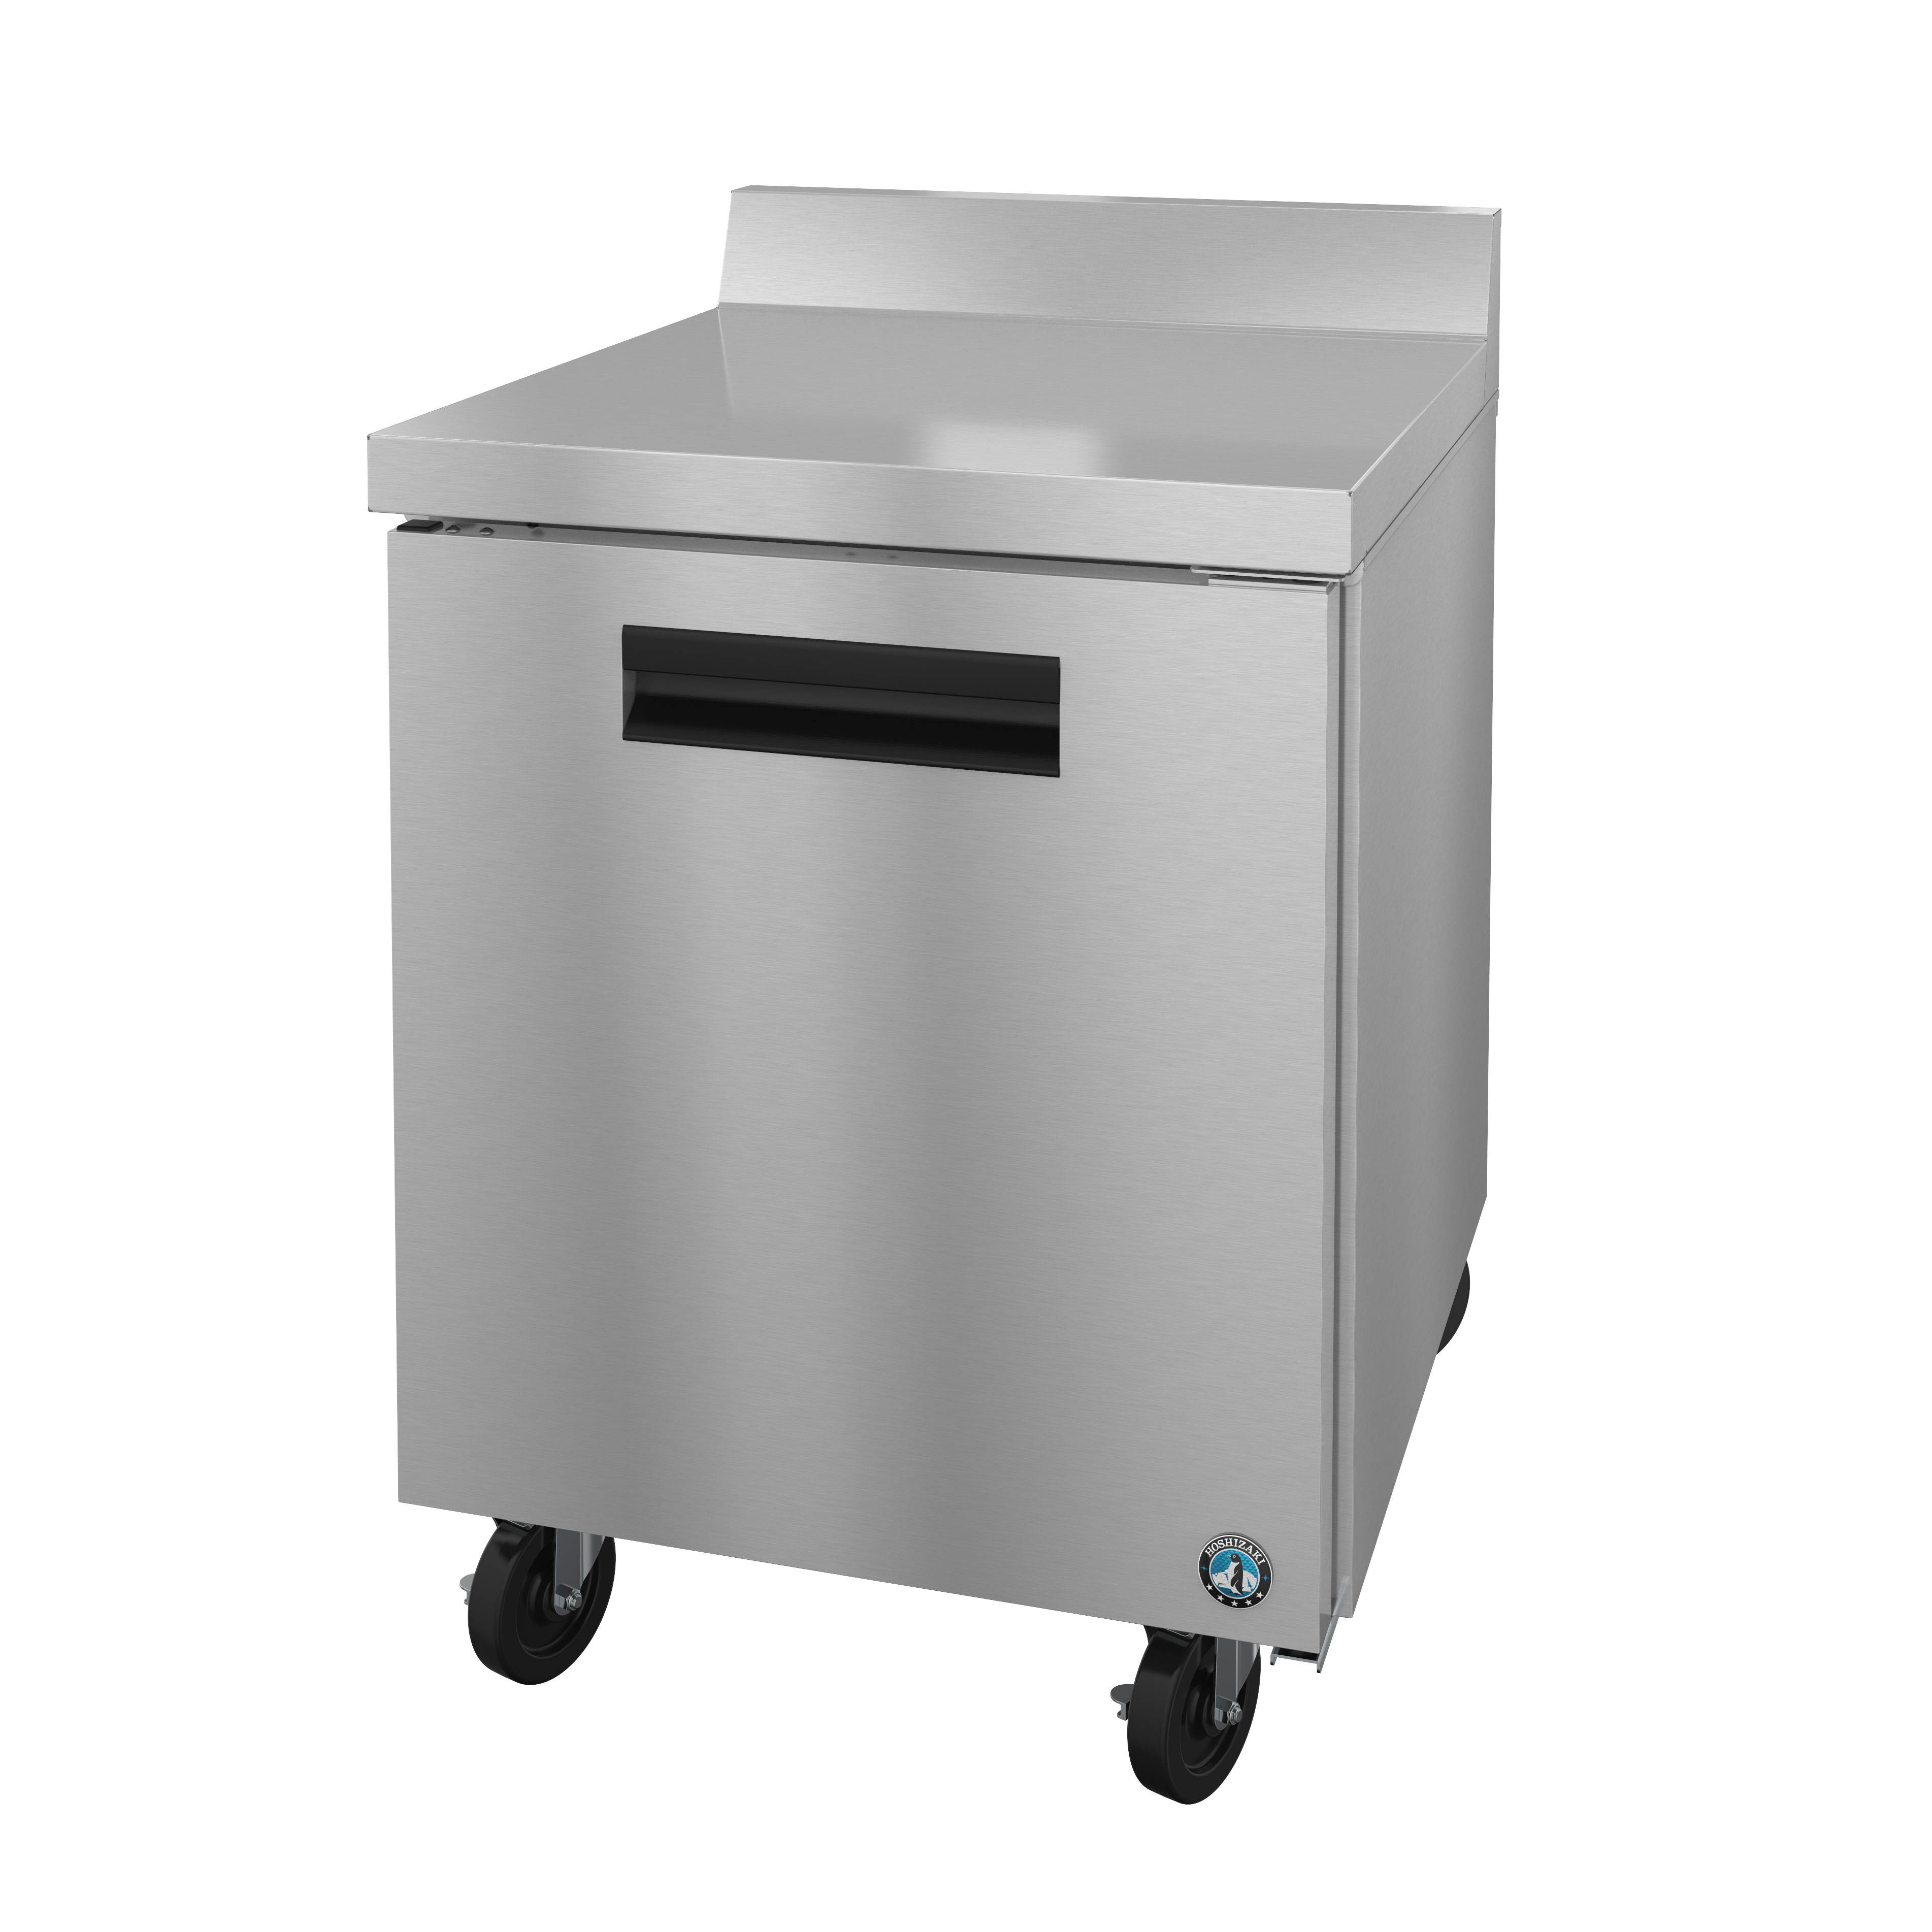 Hoshizaki WF27A freezer counter, work top